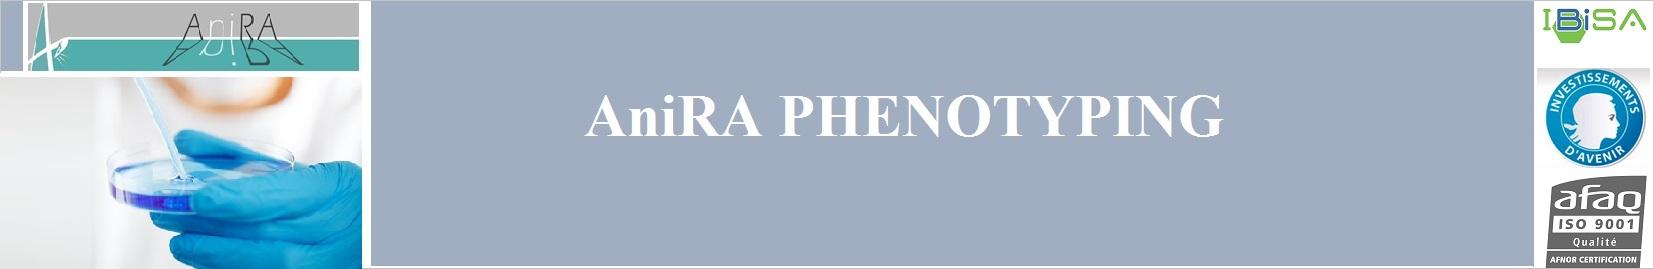 http://www.sfr-biosciences.fr/projets-labellises/Anira/phenotyping/leadImage